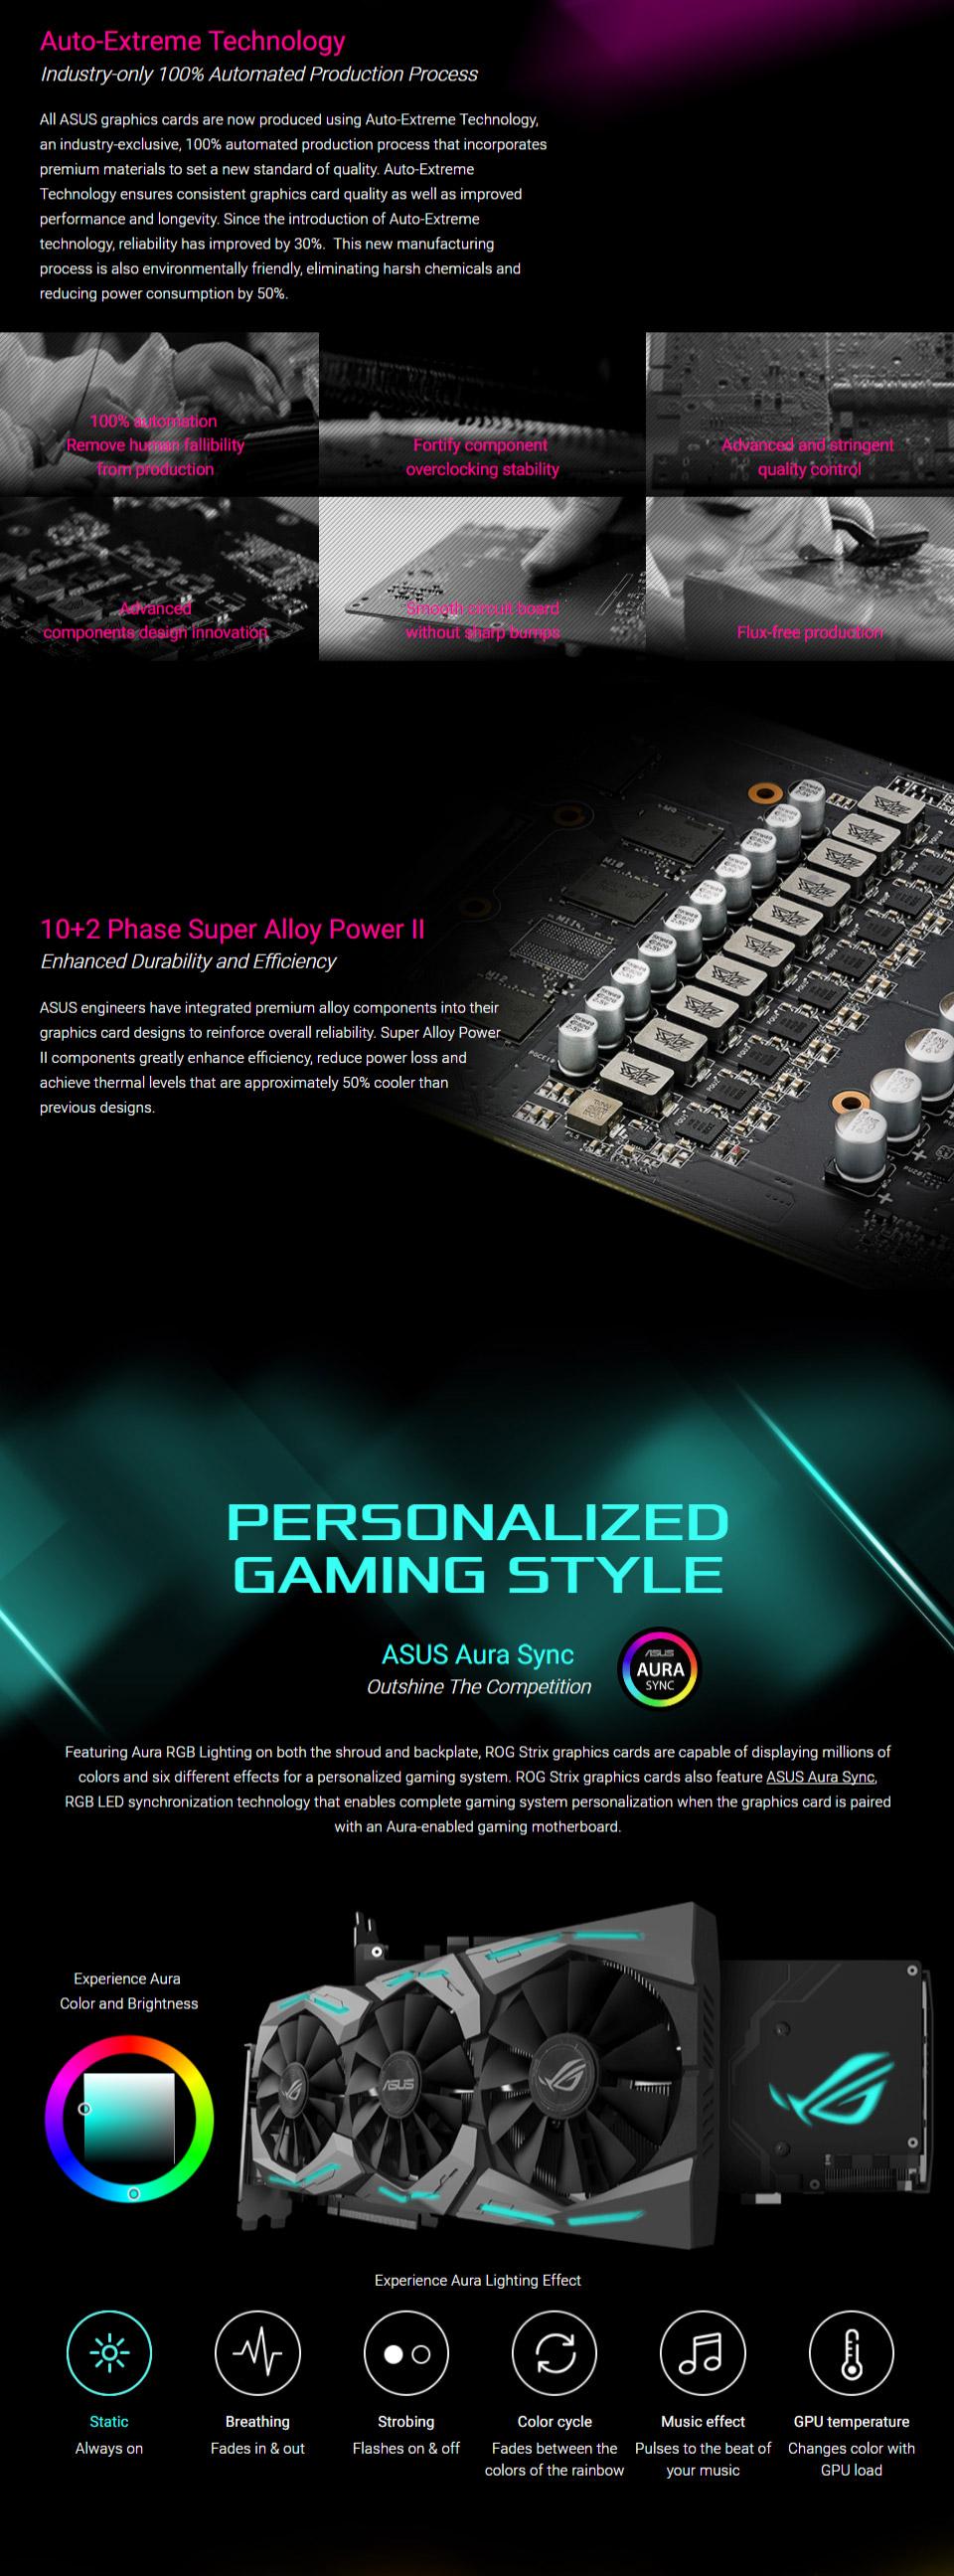 ASUS ROG Strix GeForce GTX 1080 Ti 11GB [ROG-STRIX-GTX1080TI-11G